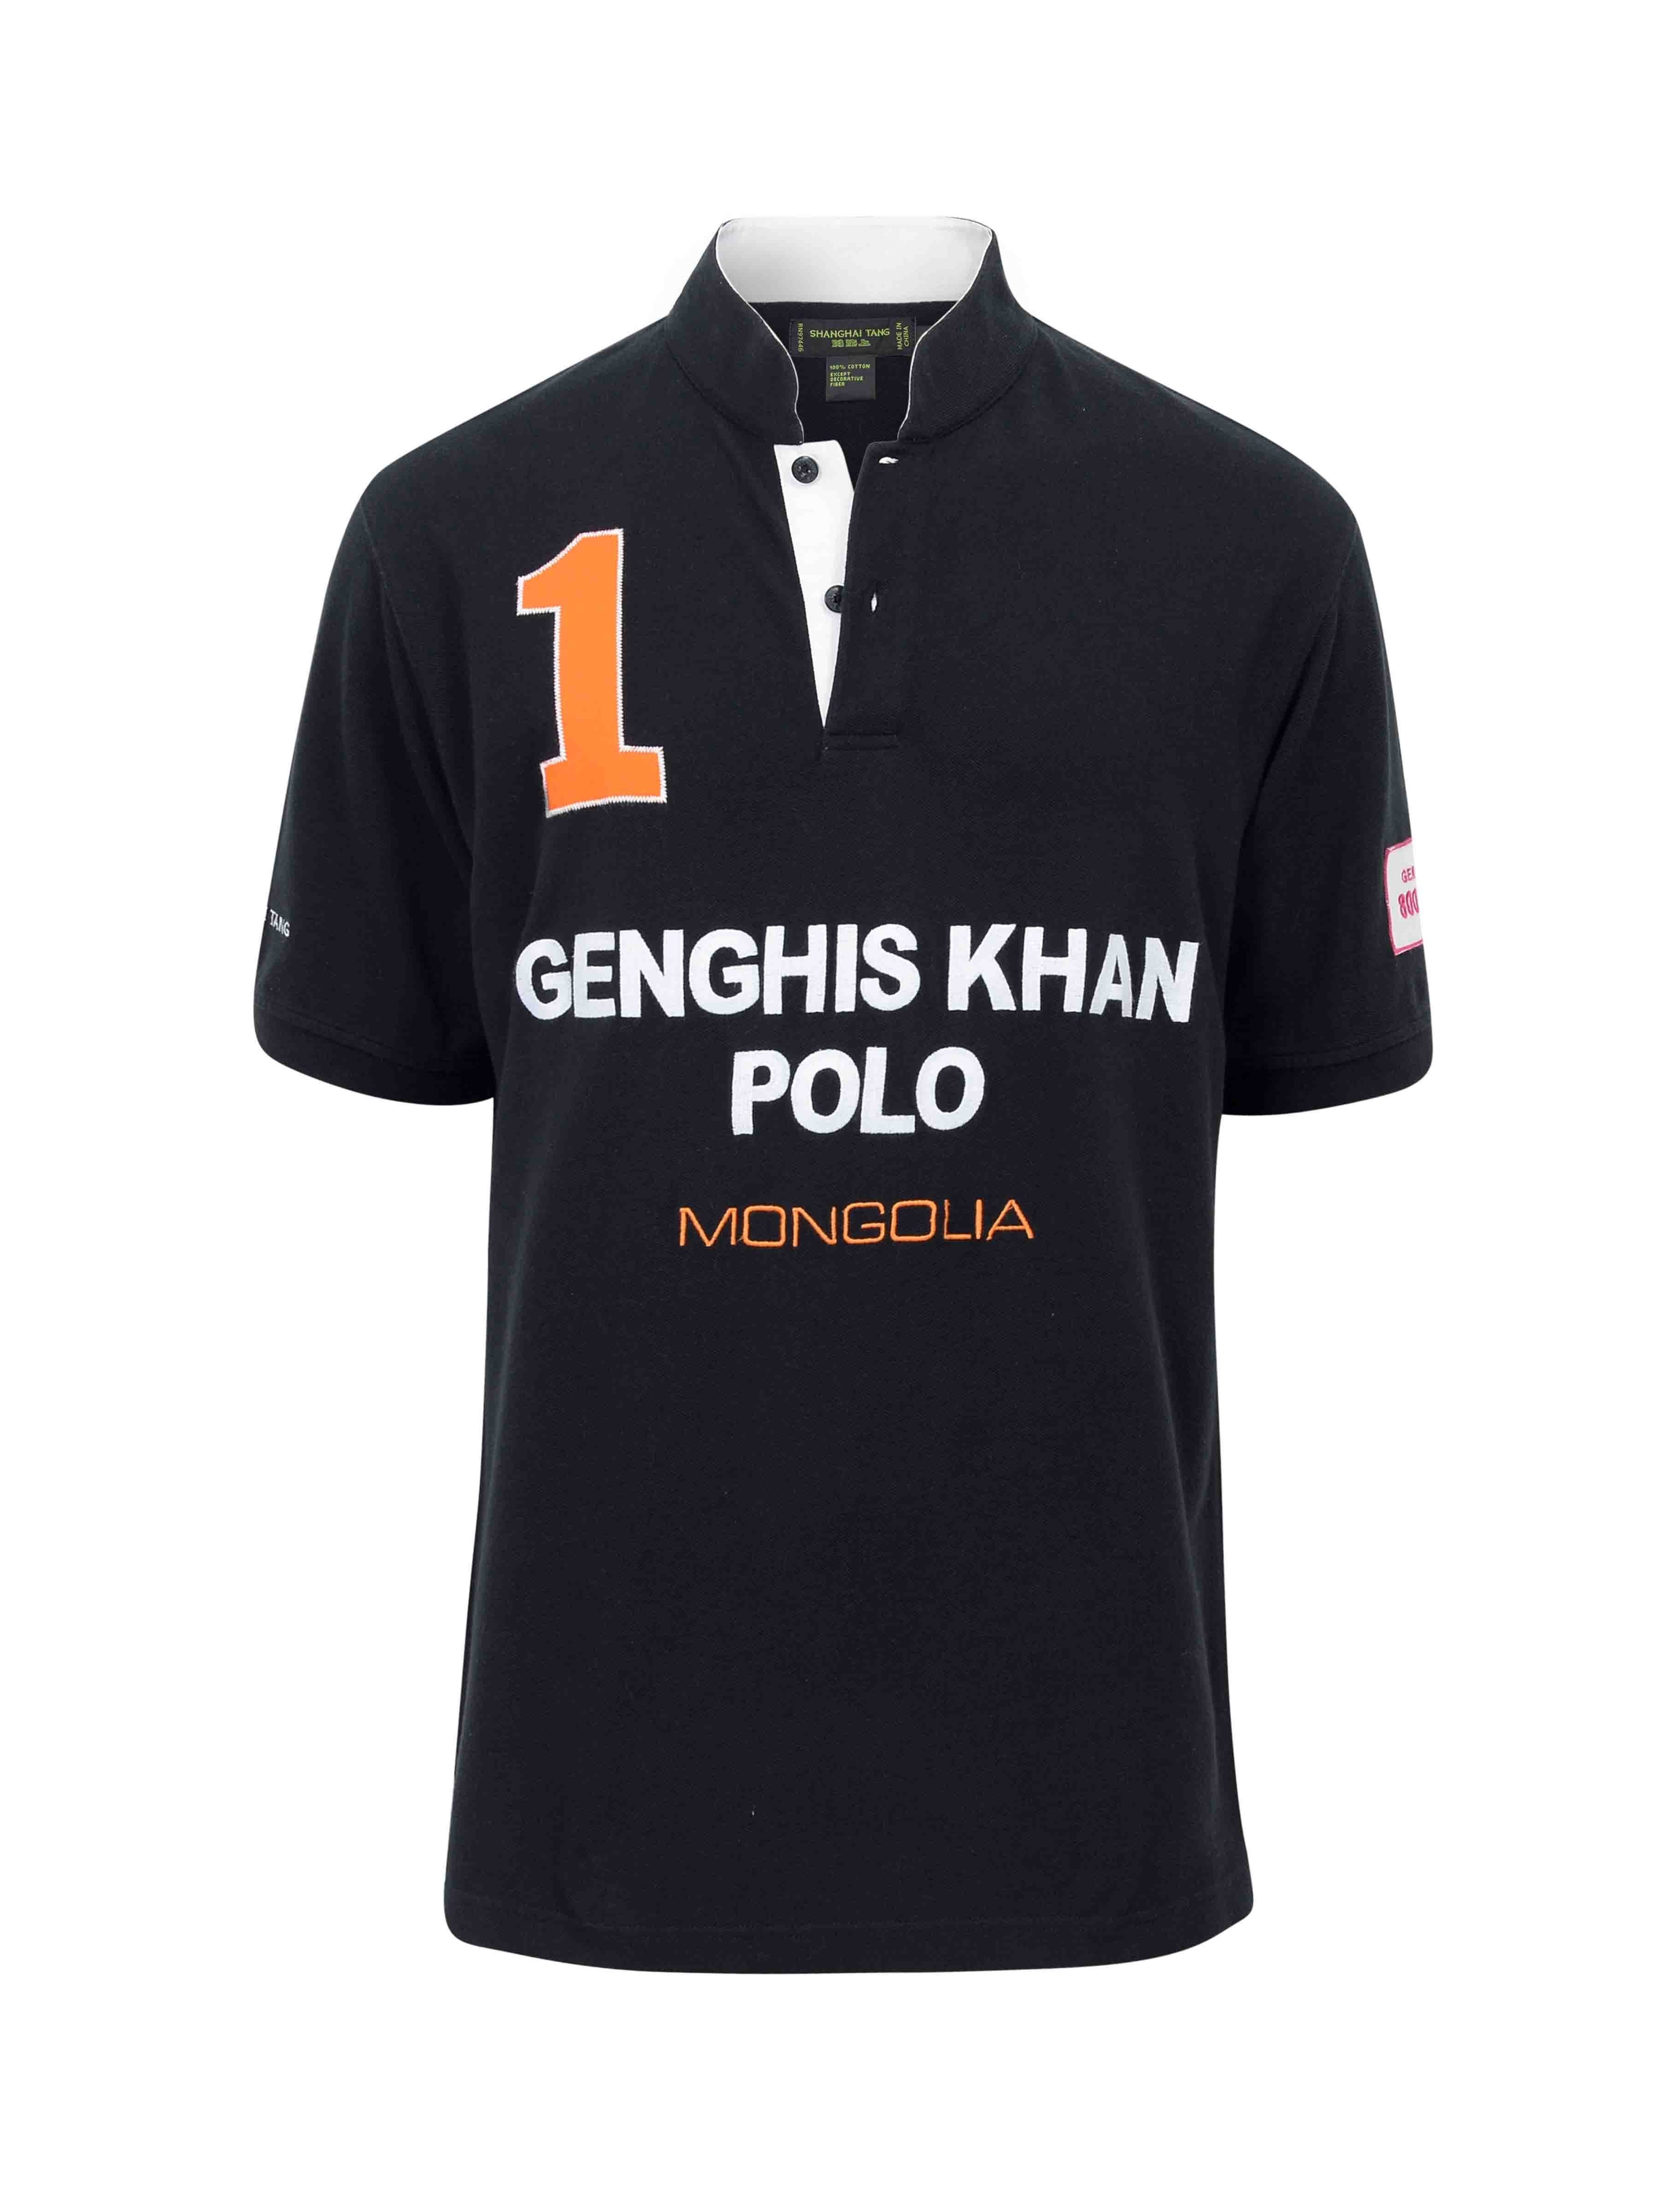 Classic Genghis Khan Polo Shirt